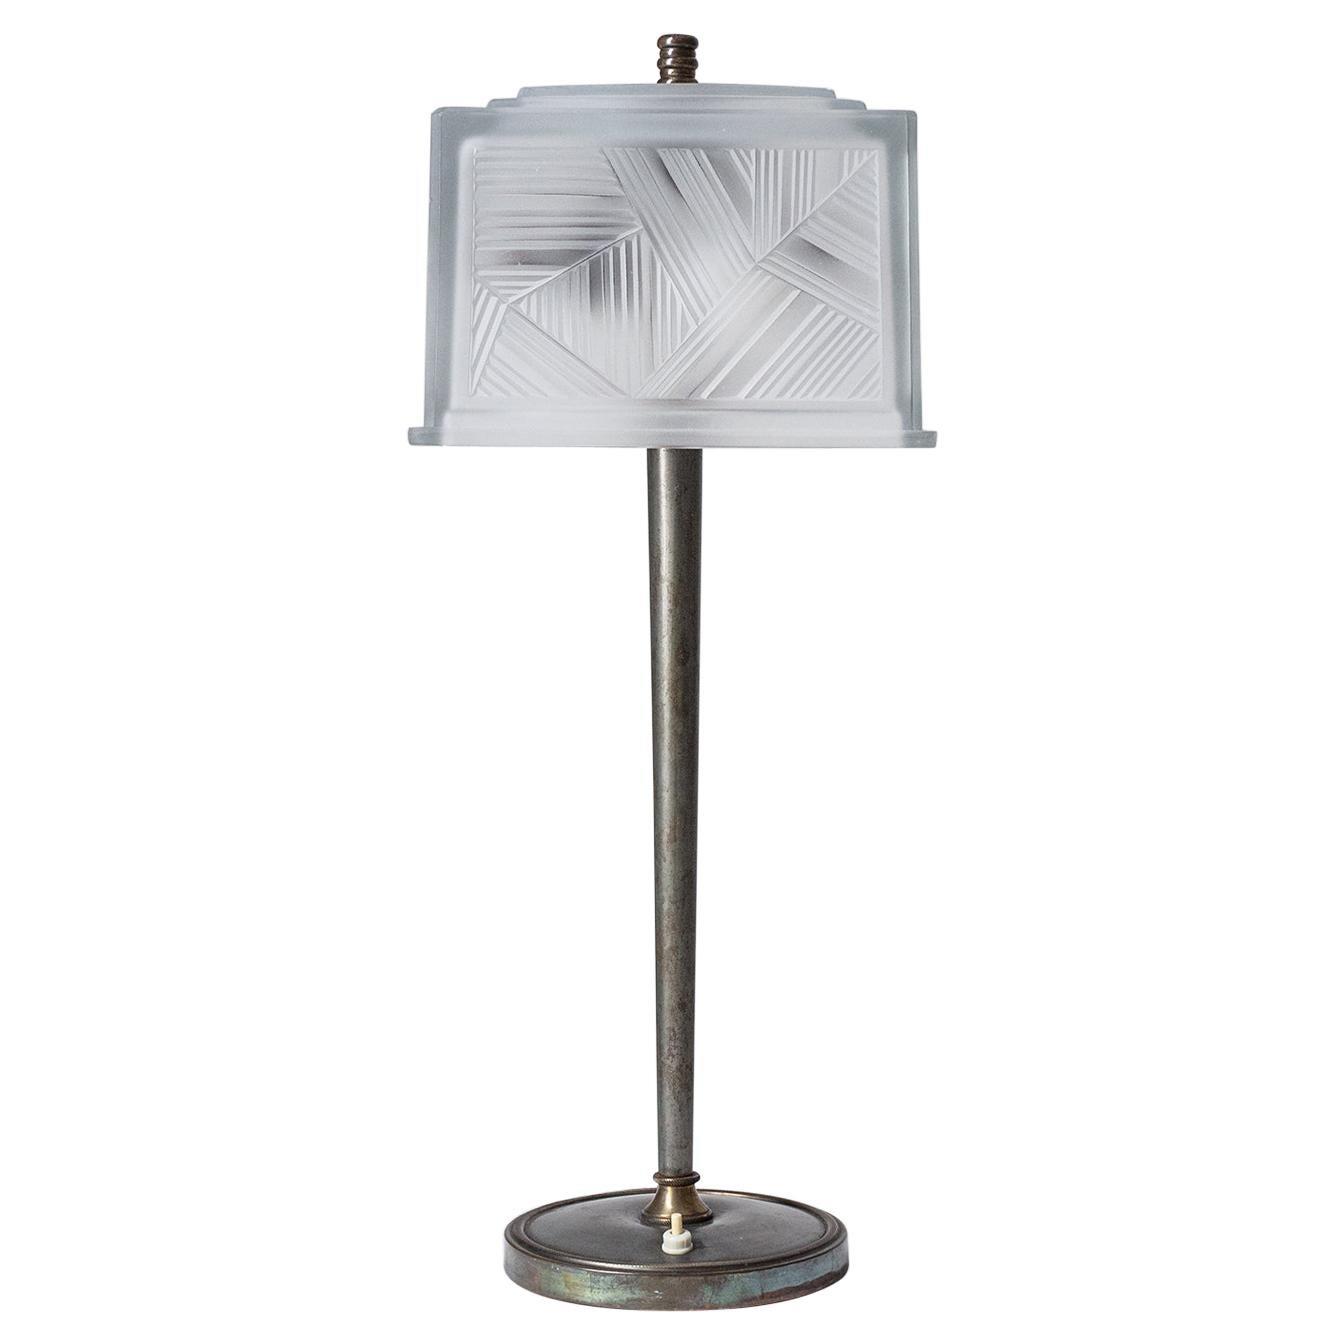 French Art Deco Table Lamp by Sabino, circa 1930